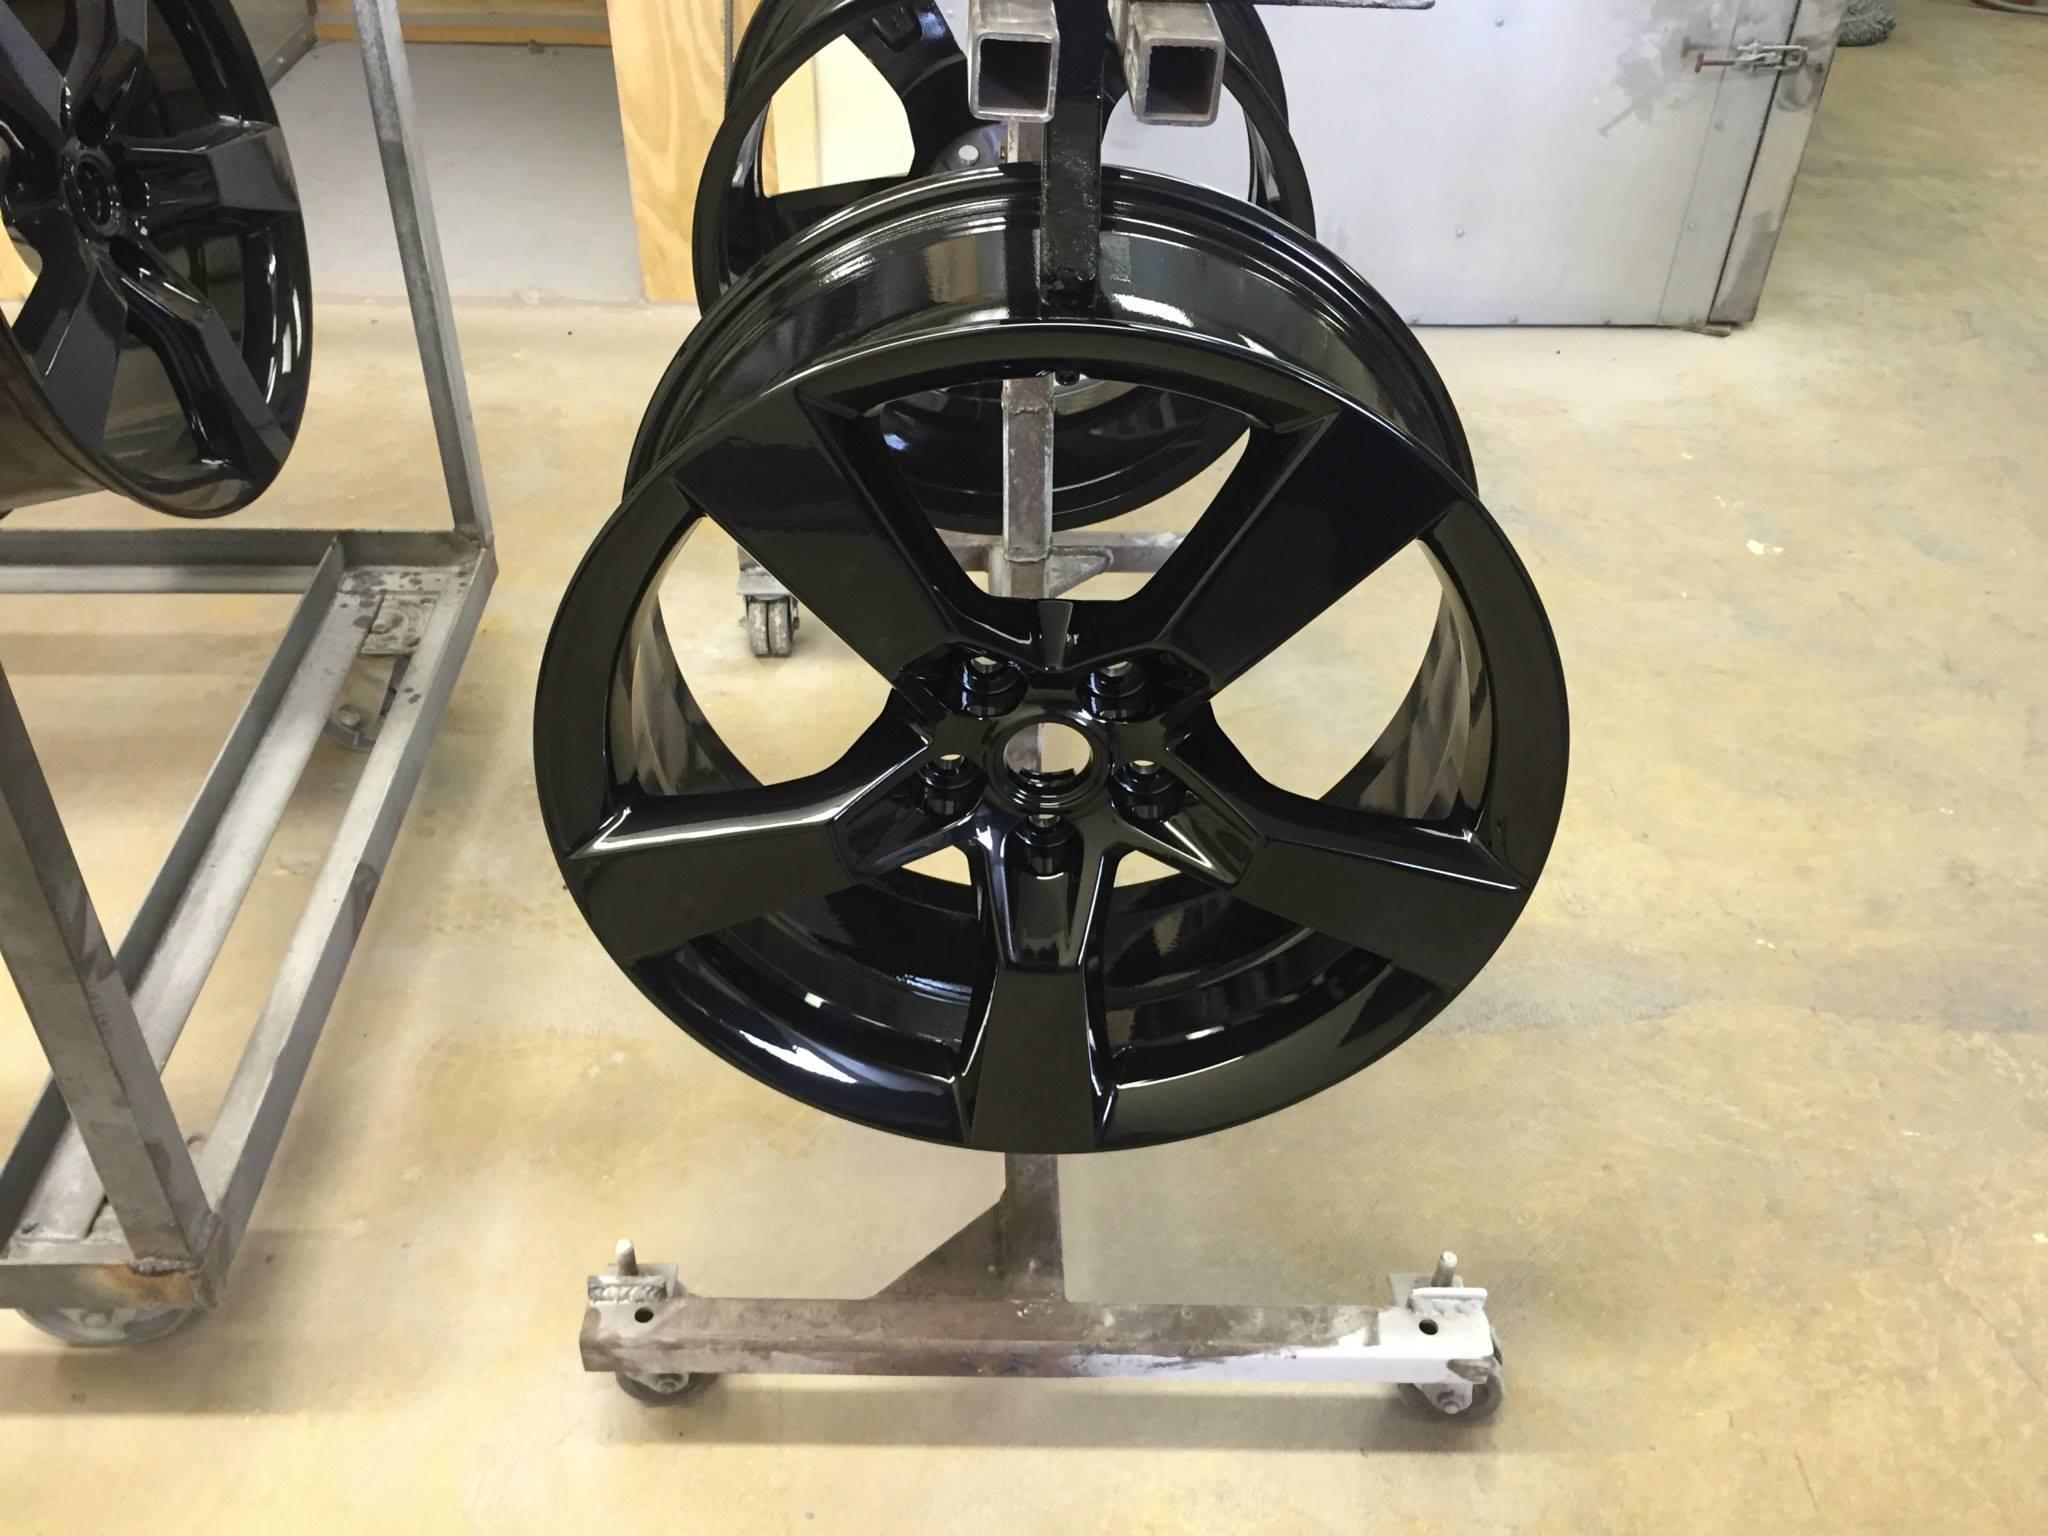 Tristate Rim & Wheel image 0